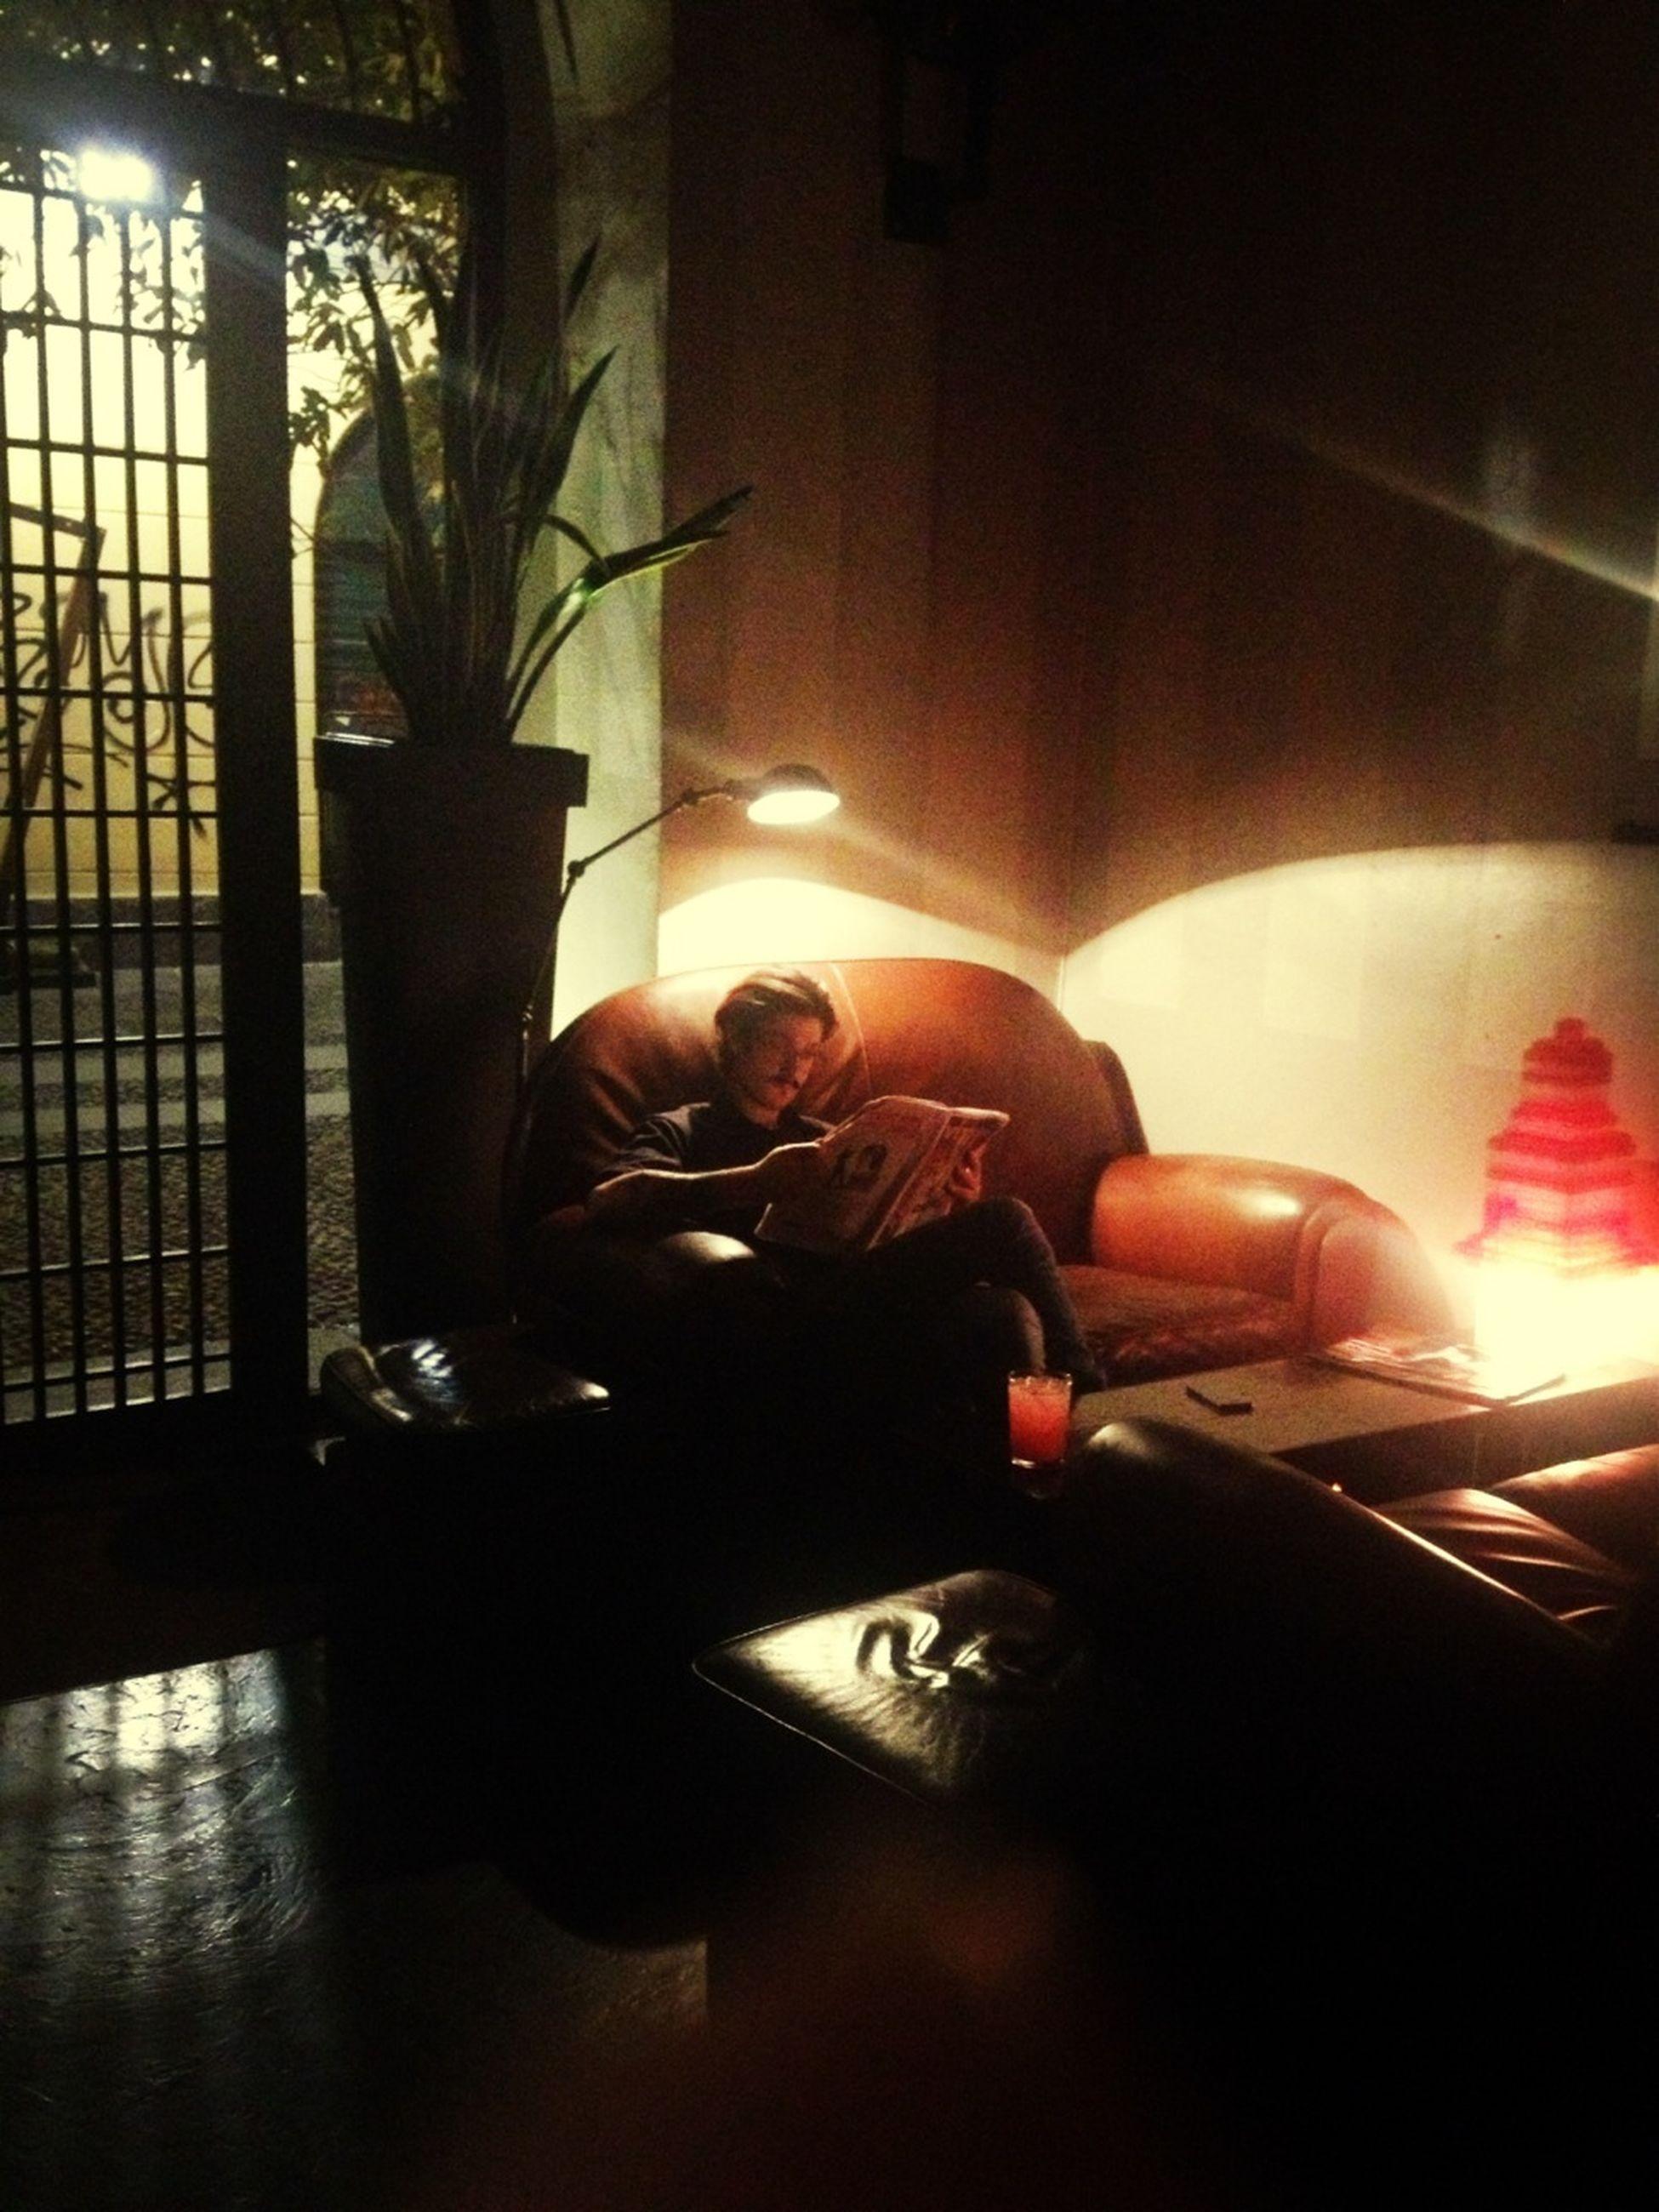 indoors, illuminated, night, home interior, lighting equipment, light - natural phenomenon, dark, glowing, sitting, sunlight, reflection, table, lifestyles, chair, house, domestic room, men, high angle view